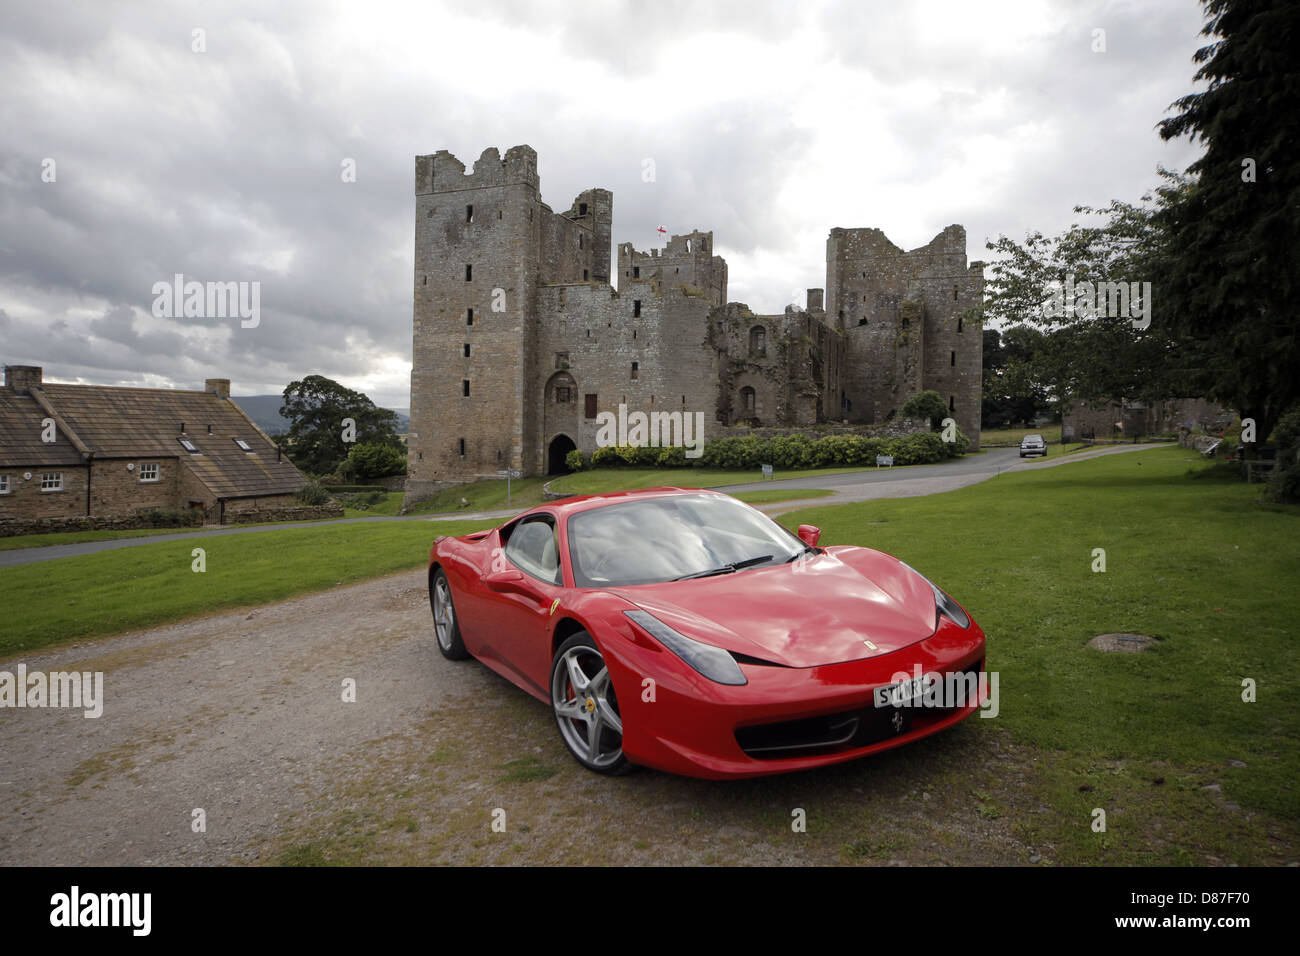 FERRARI 458 ITALIA CAR & BOLTON CASTLE BOLTON NORTH YORKSHIRE ENGLAND 28 July 2012 - Stock Image